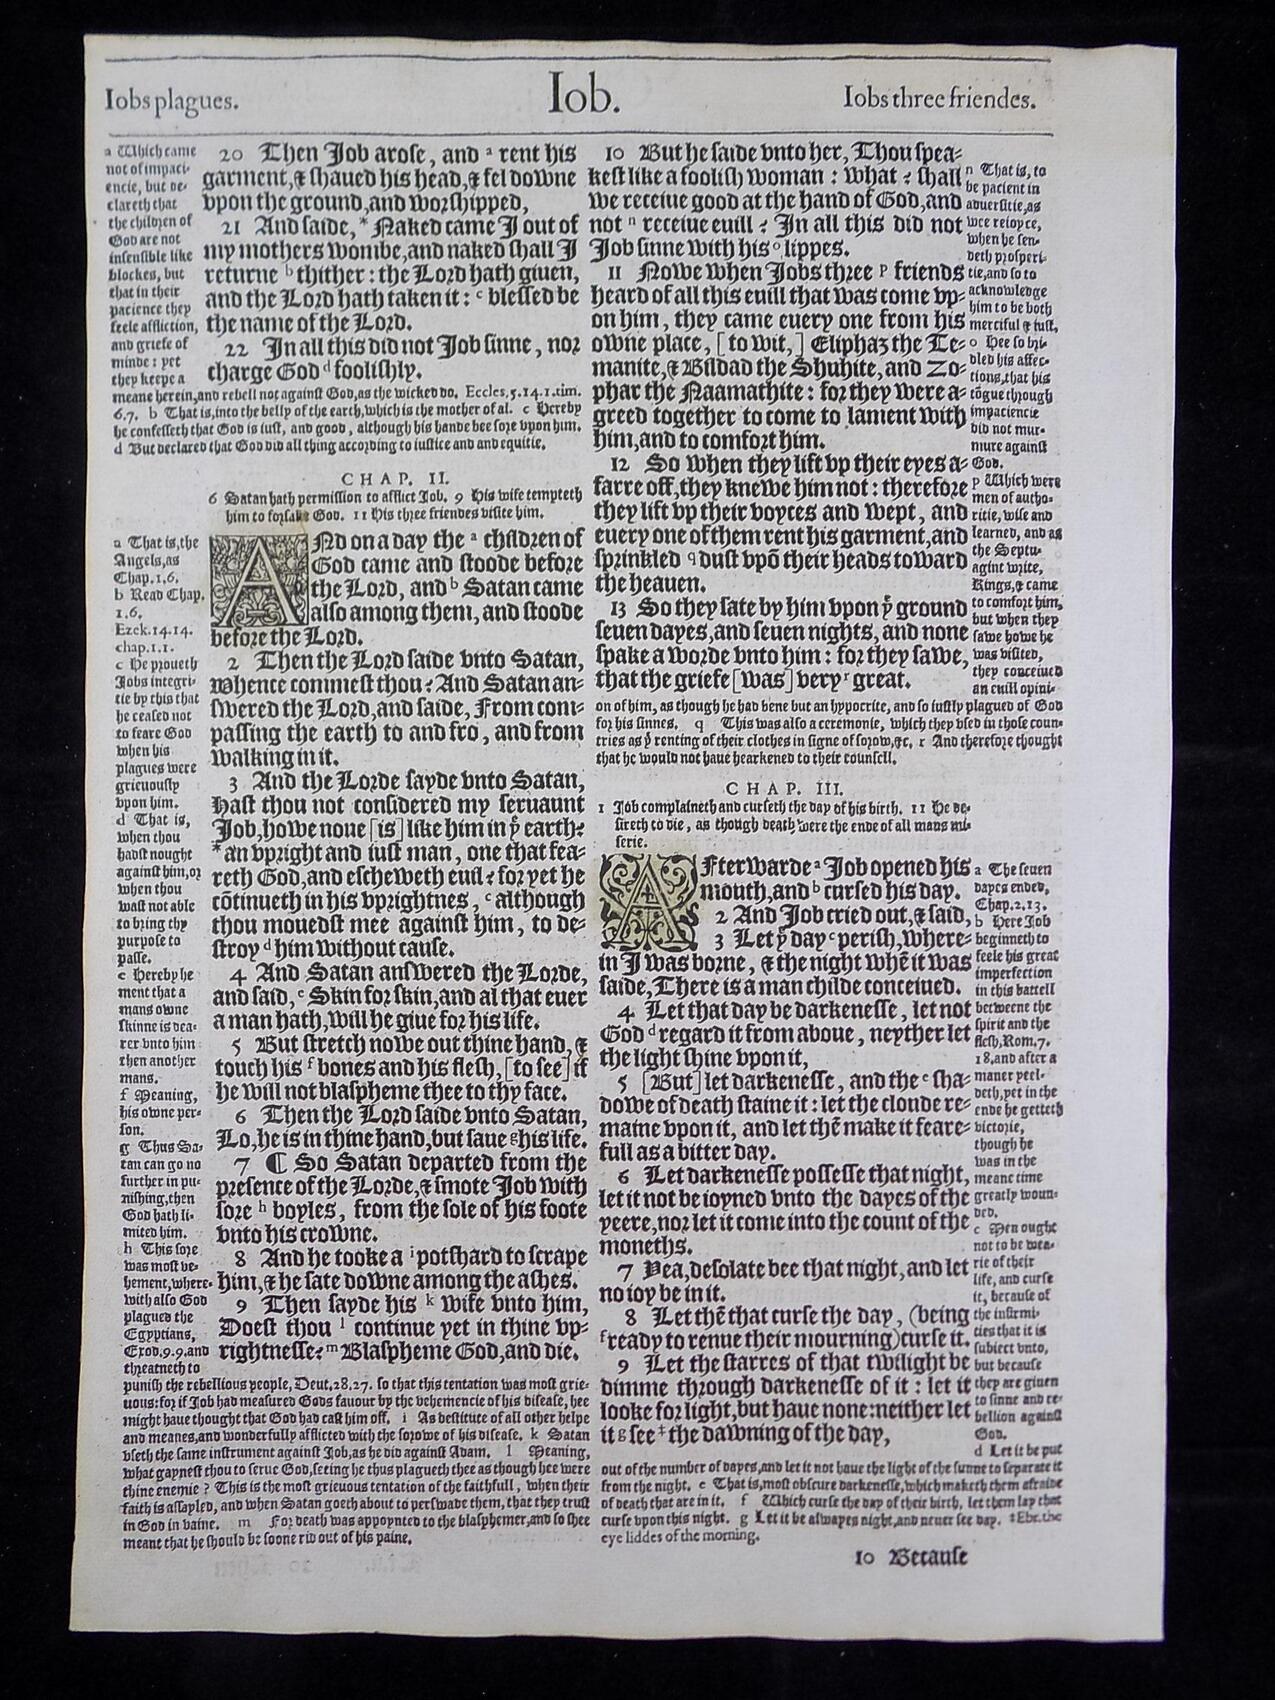 1583 NOBLEST GENEVA BIBLE LEAVES BOOK OF JOB